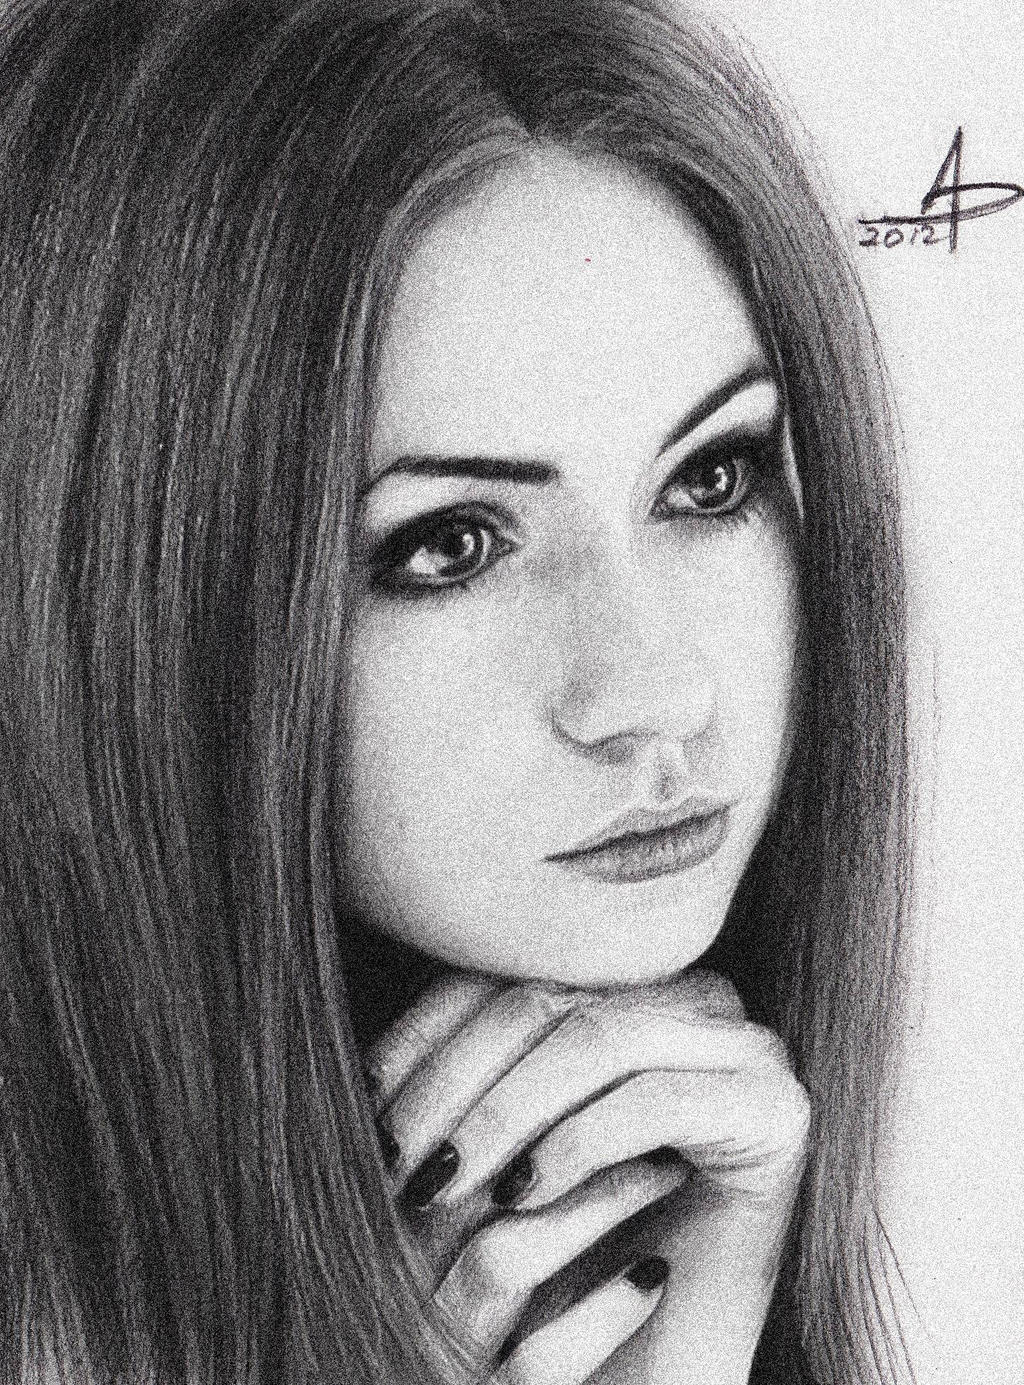 Amy Pond / Doctor Who by phantosmagoria